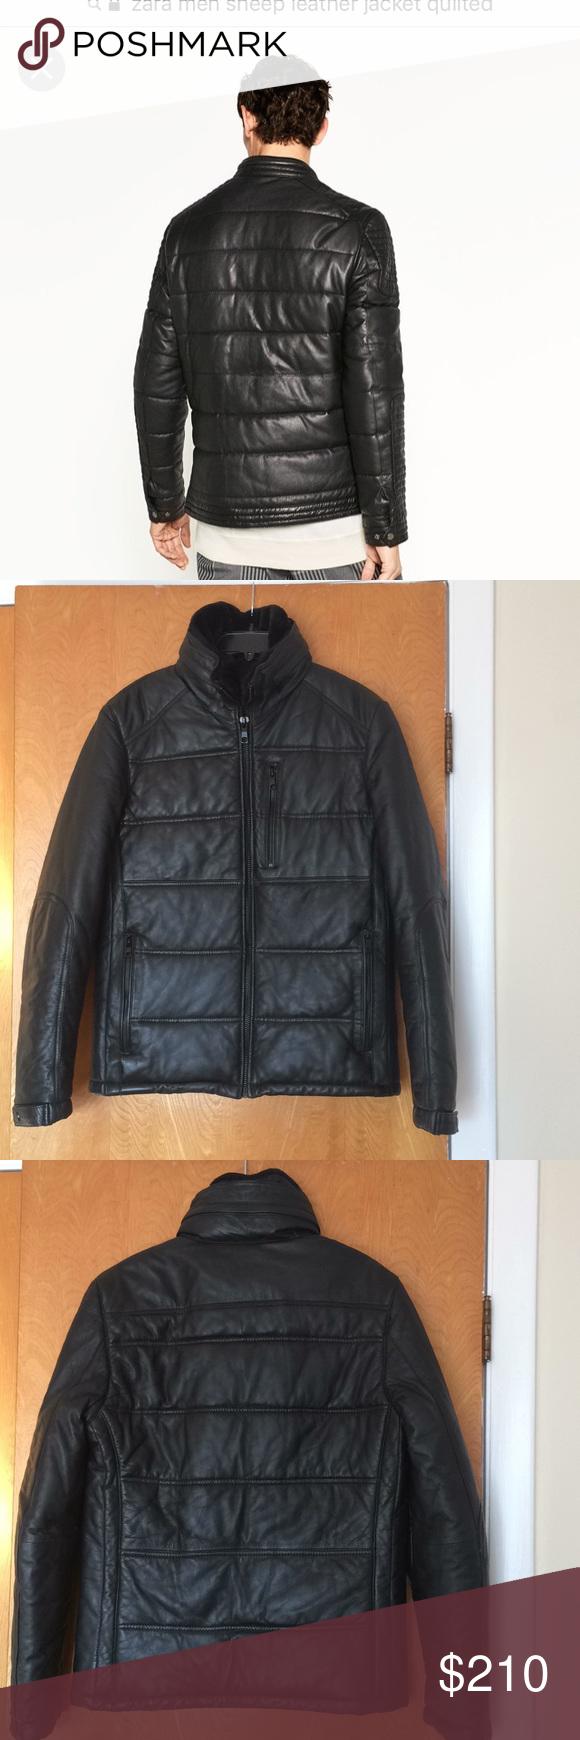 Zara sheepskin leather jacket. Sz. M (With images